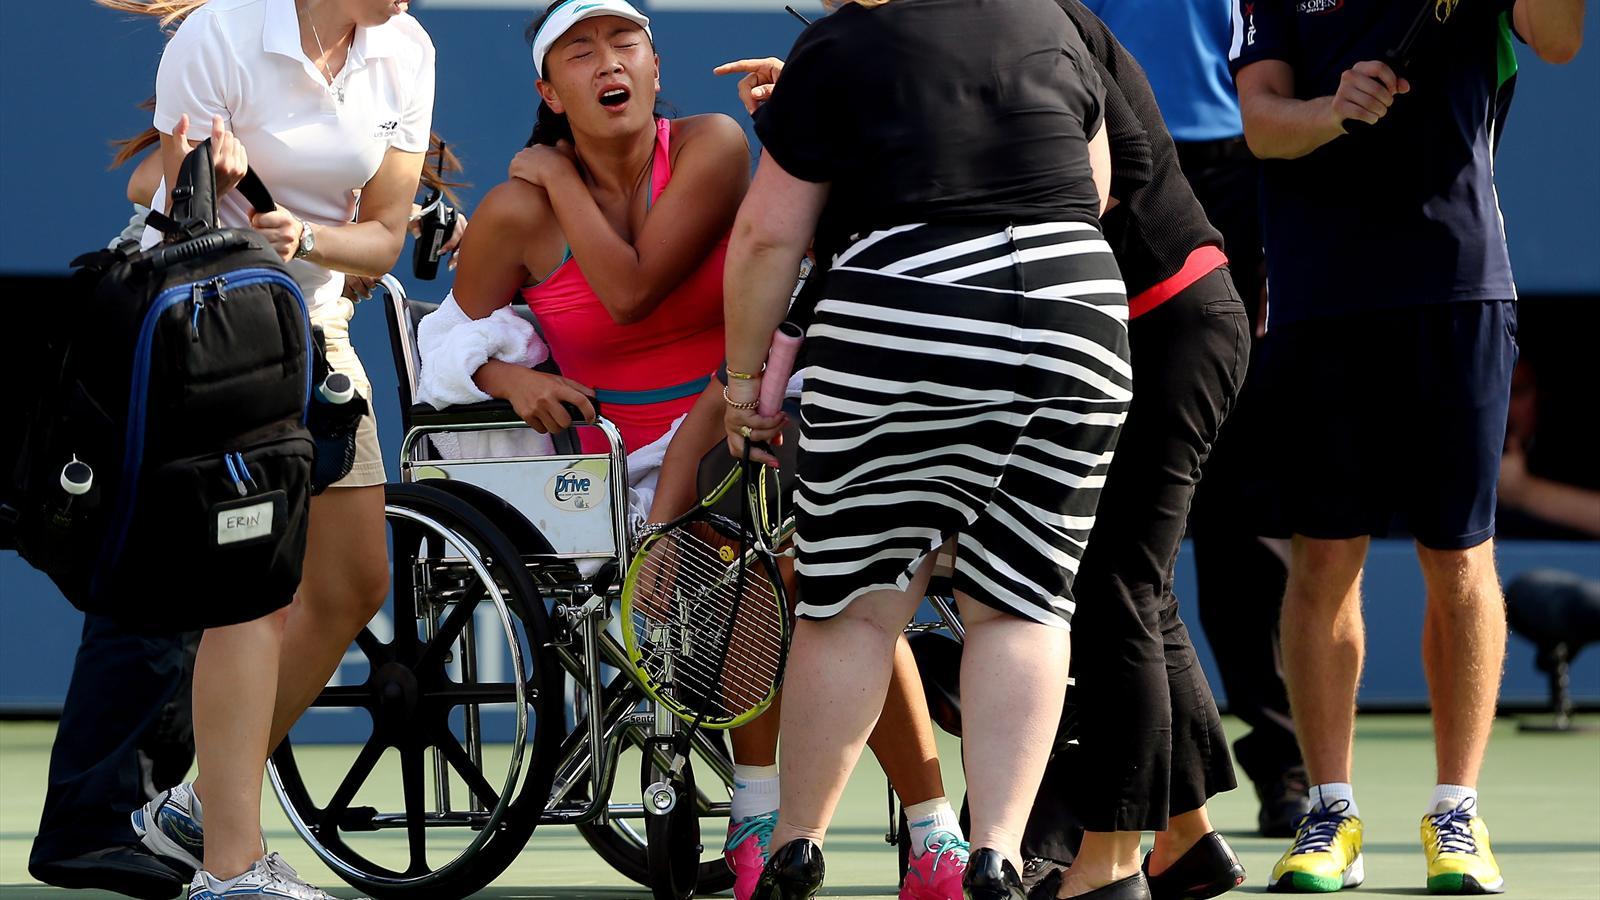 wheelchair emirates x rocker gaming chair power cord peng leaves in as wozniacki makes final us